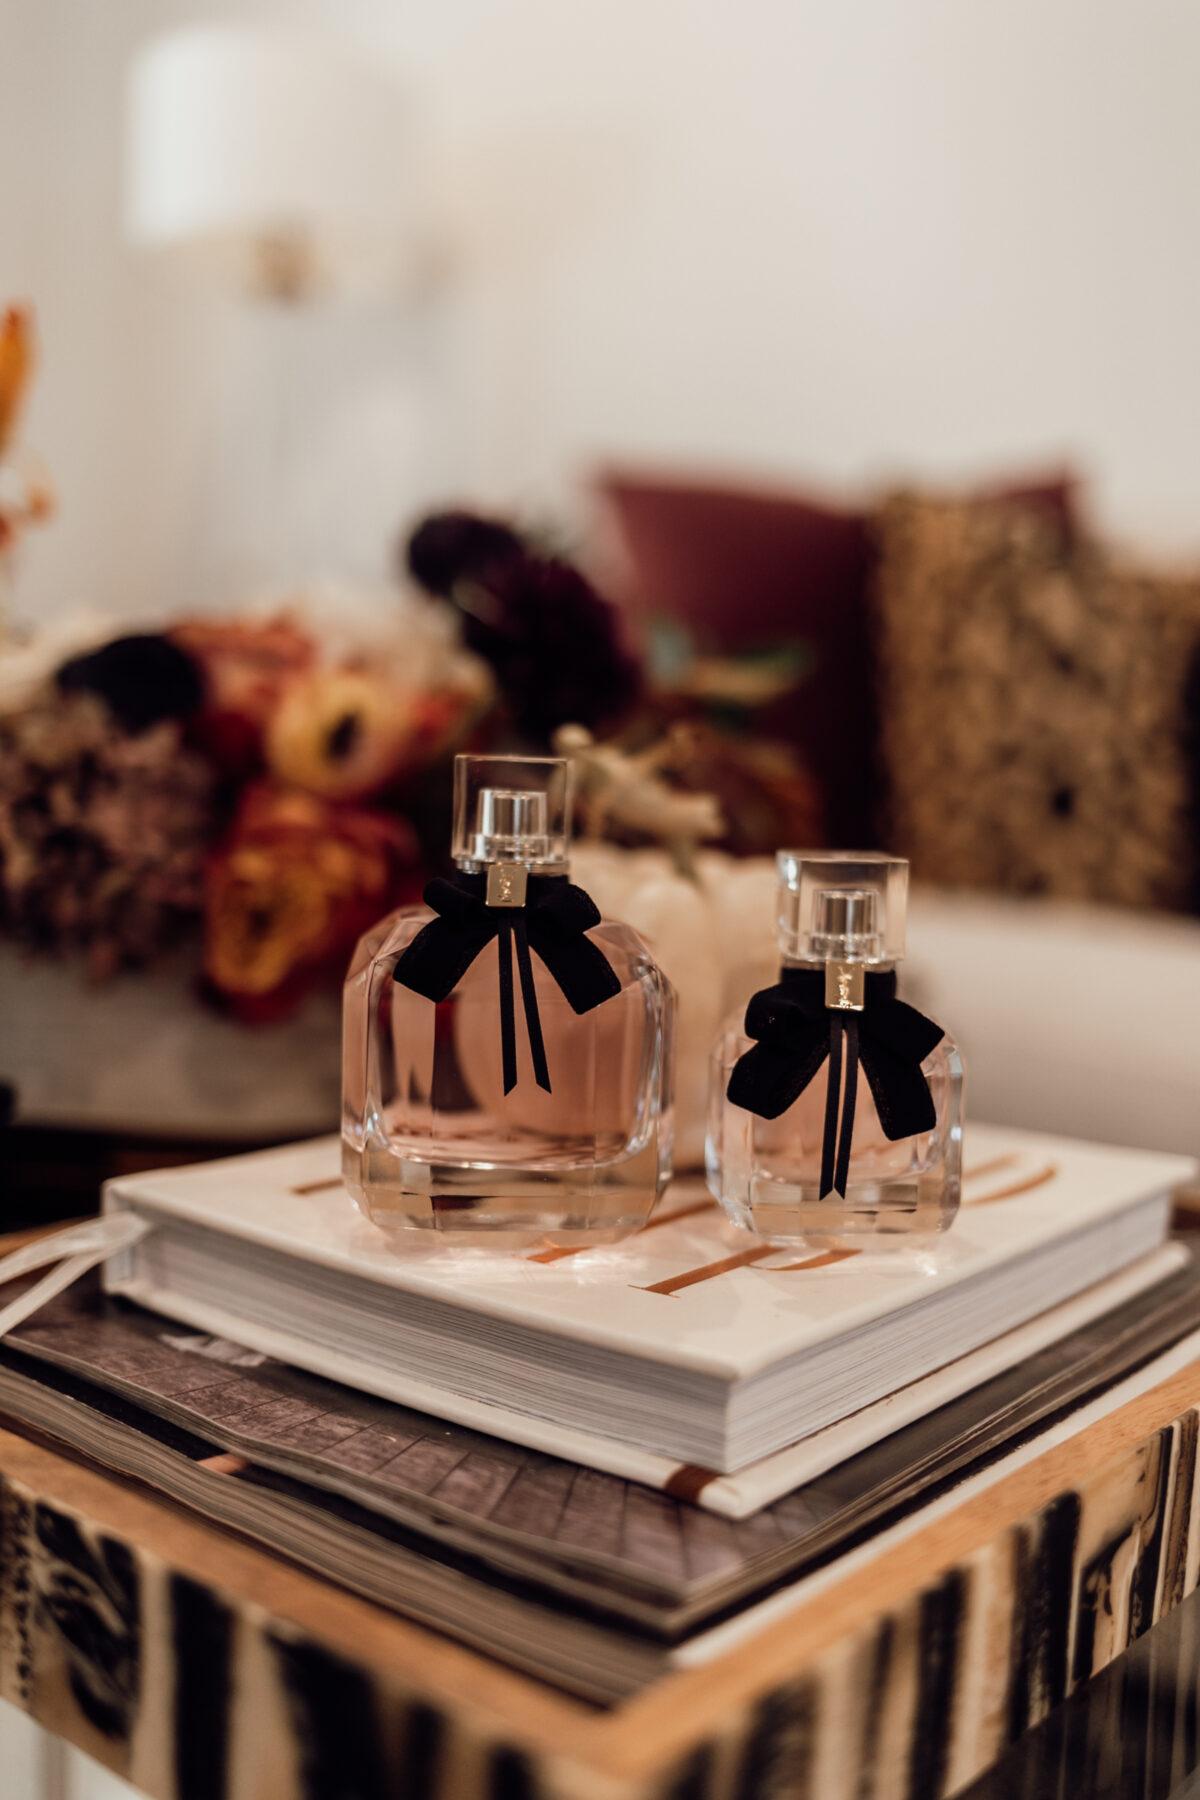 YSL Mon Paris Perfume